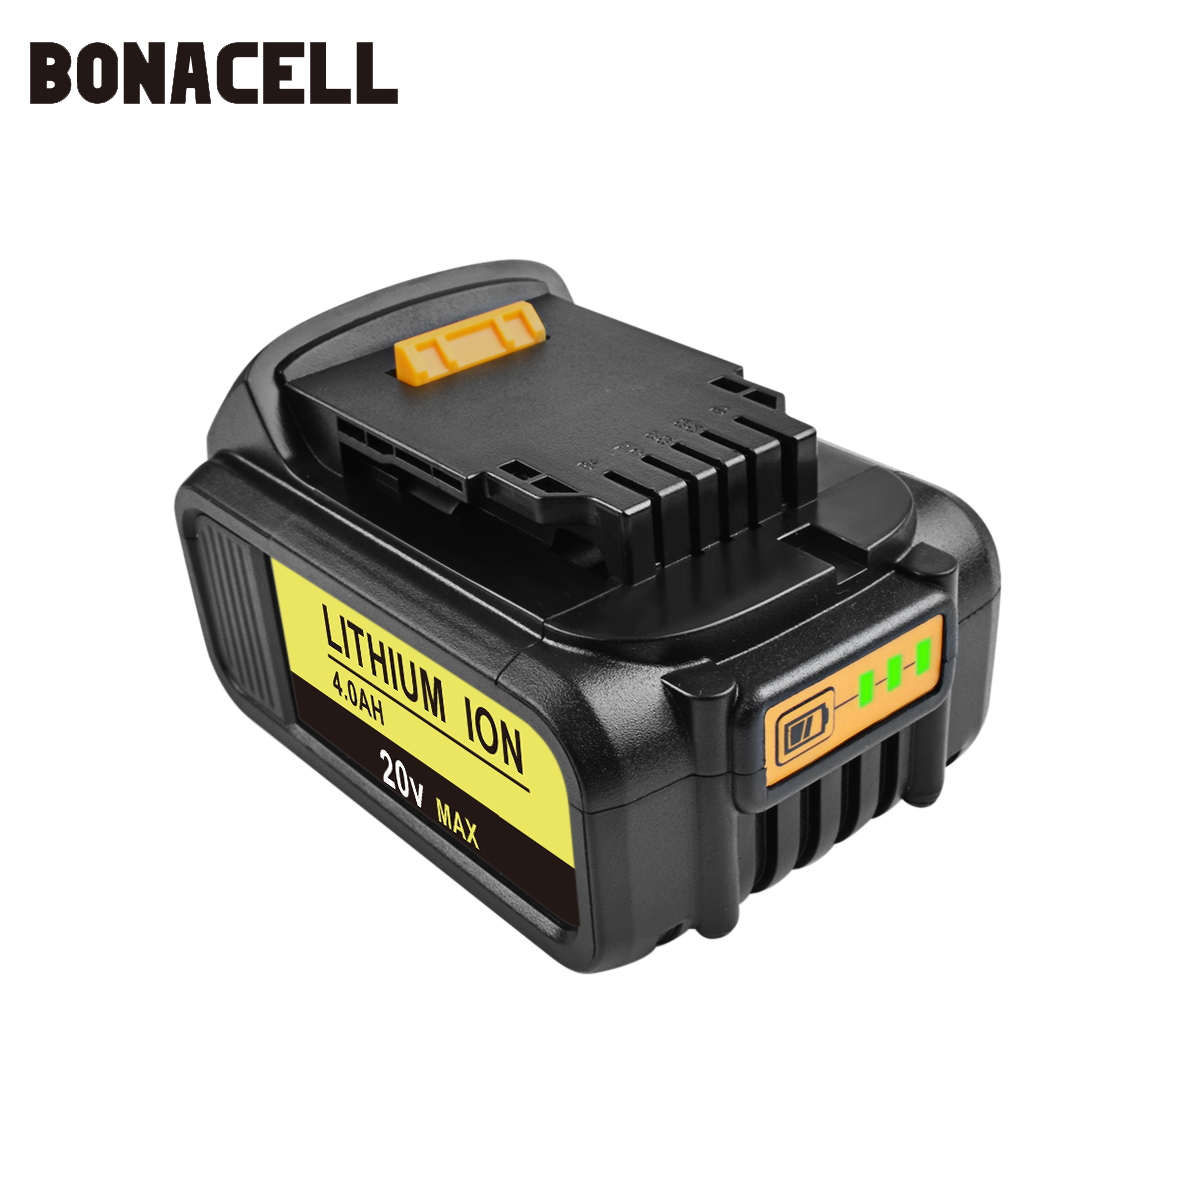 Image 2 - Bonacell Battery for Dewalt 4000mAh Replacement Battery for DCB200 DCB181 DCB182 DCB204 2  DCB201 DCB201 2 L10-in Replacement Batteries from Consumer Electronics